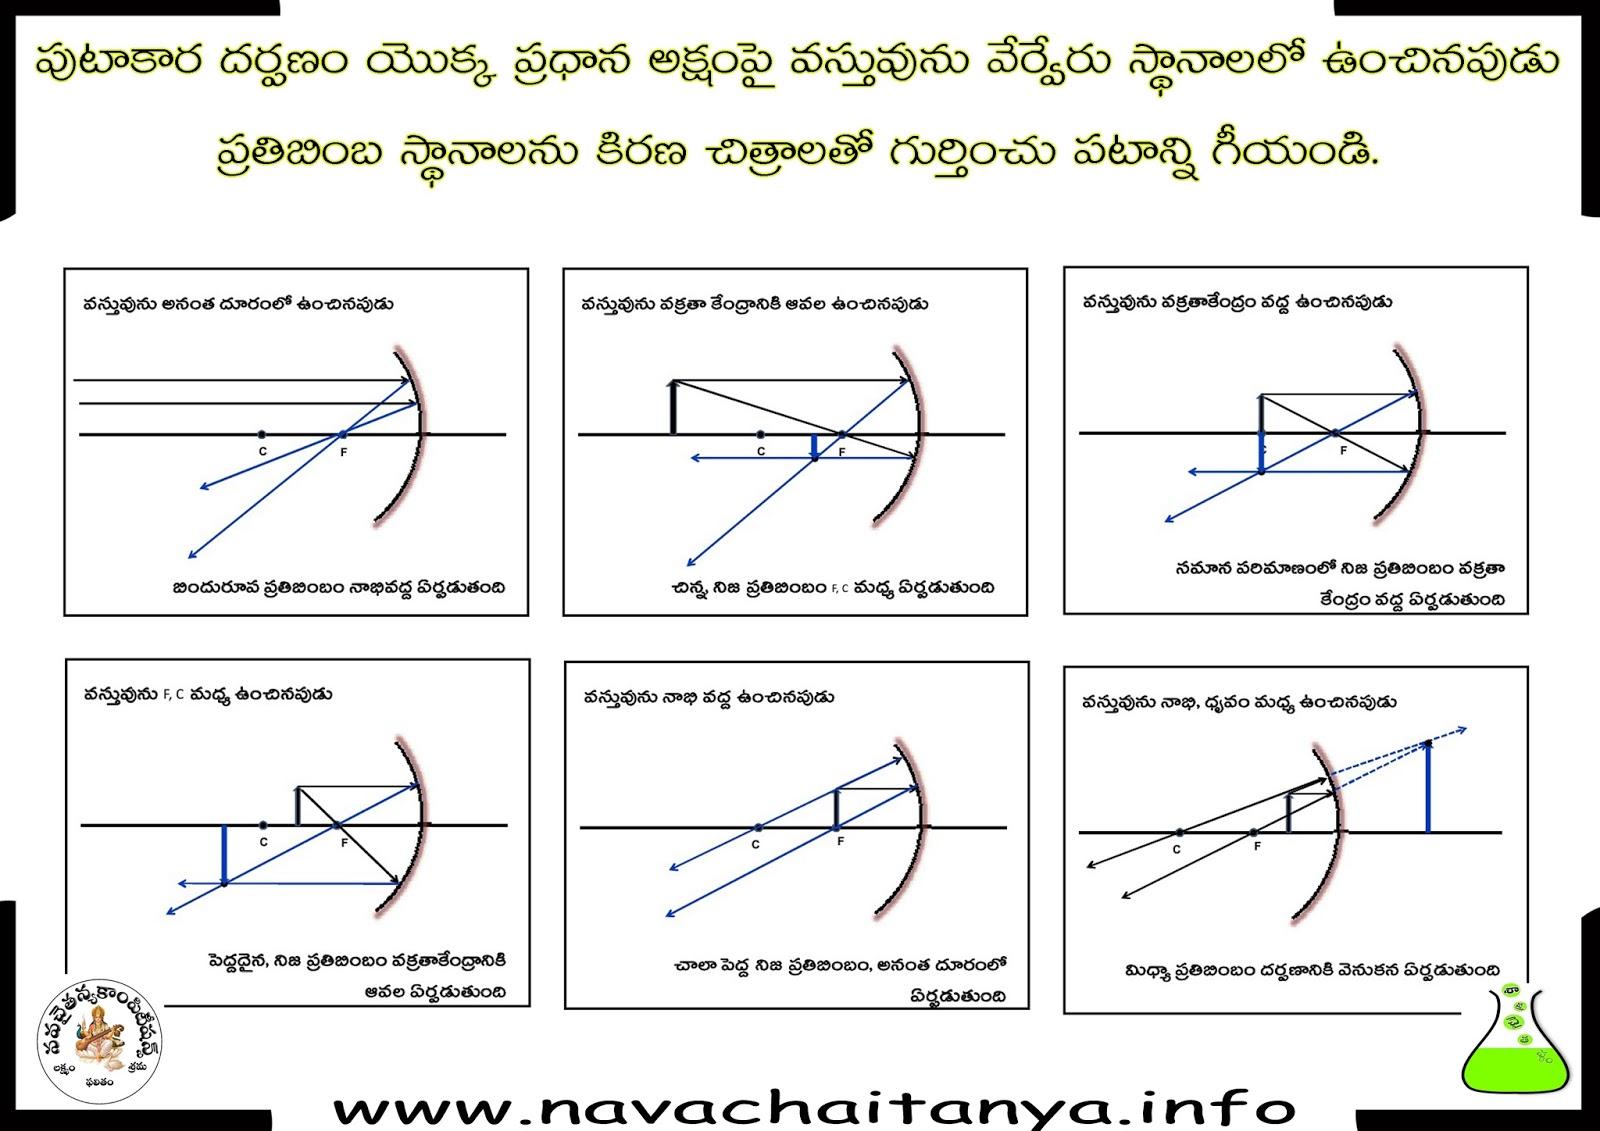 science diagrams of class 10 macbeth plot diagram 10th physical పటకర దరపణ పర